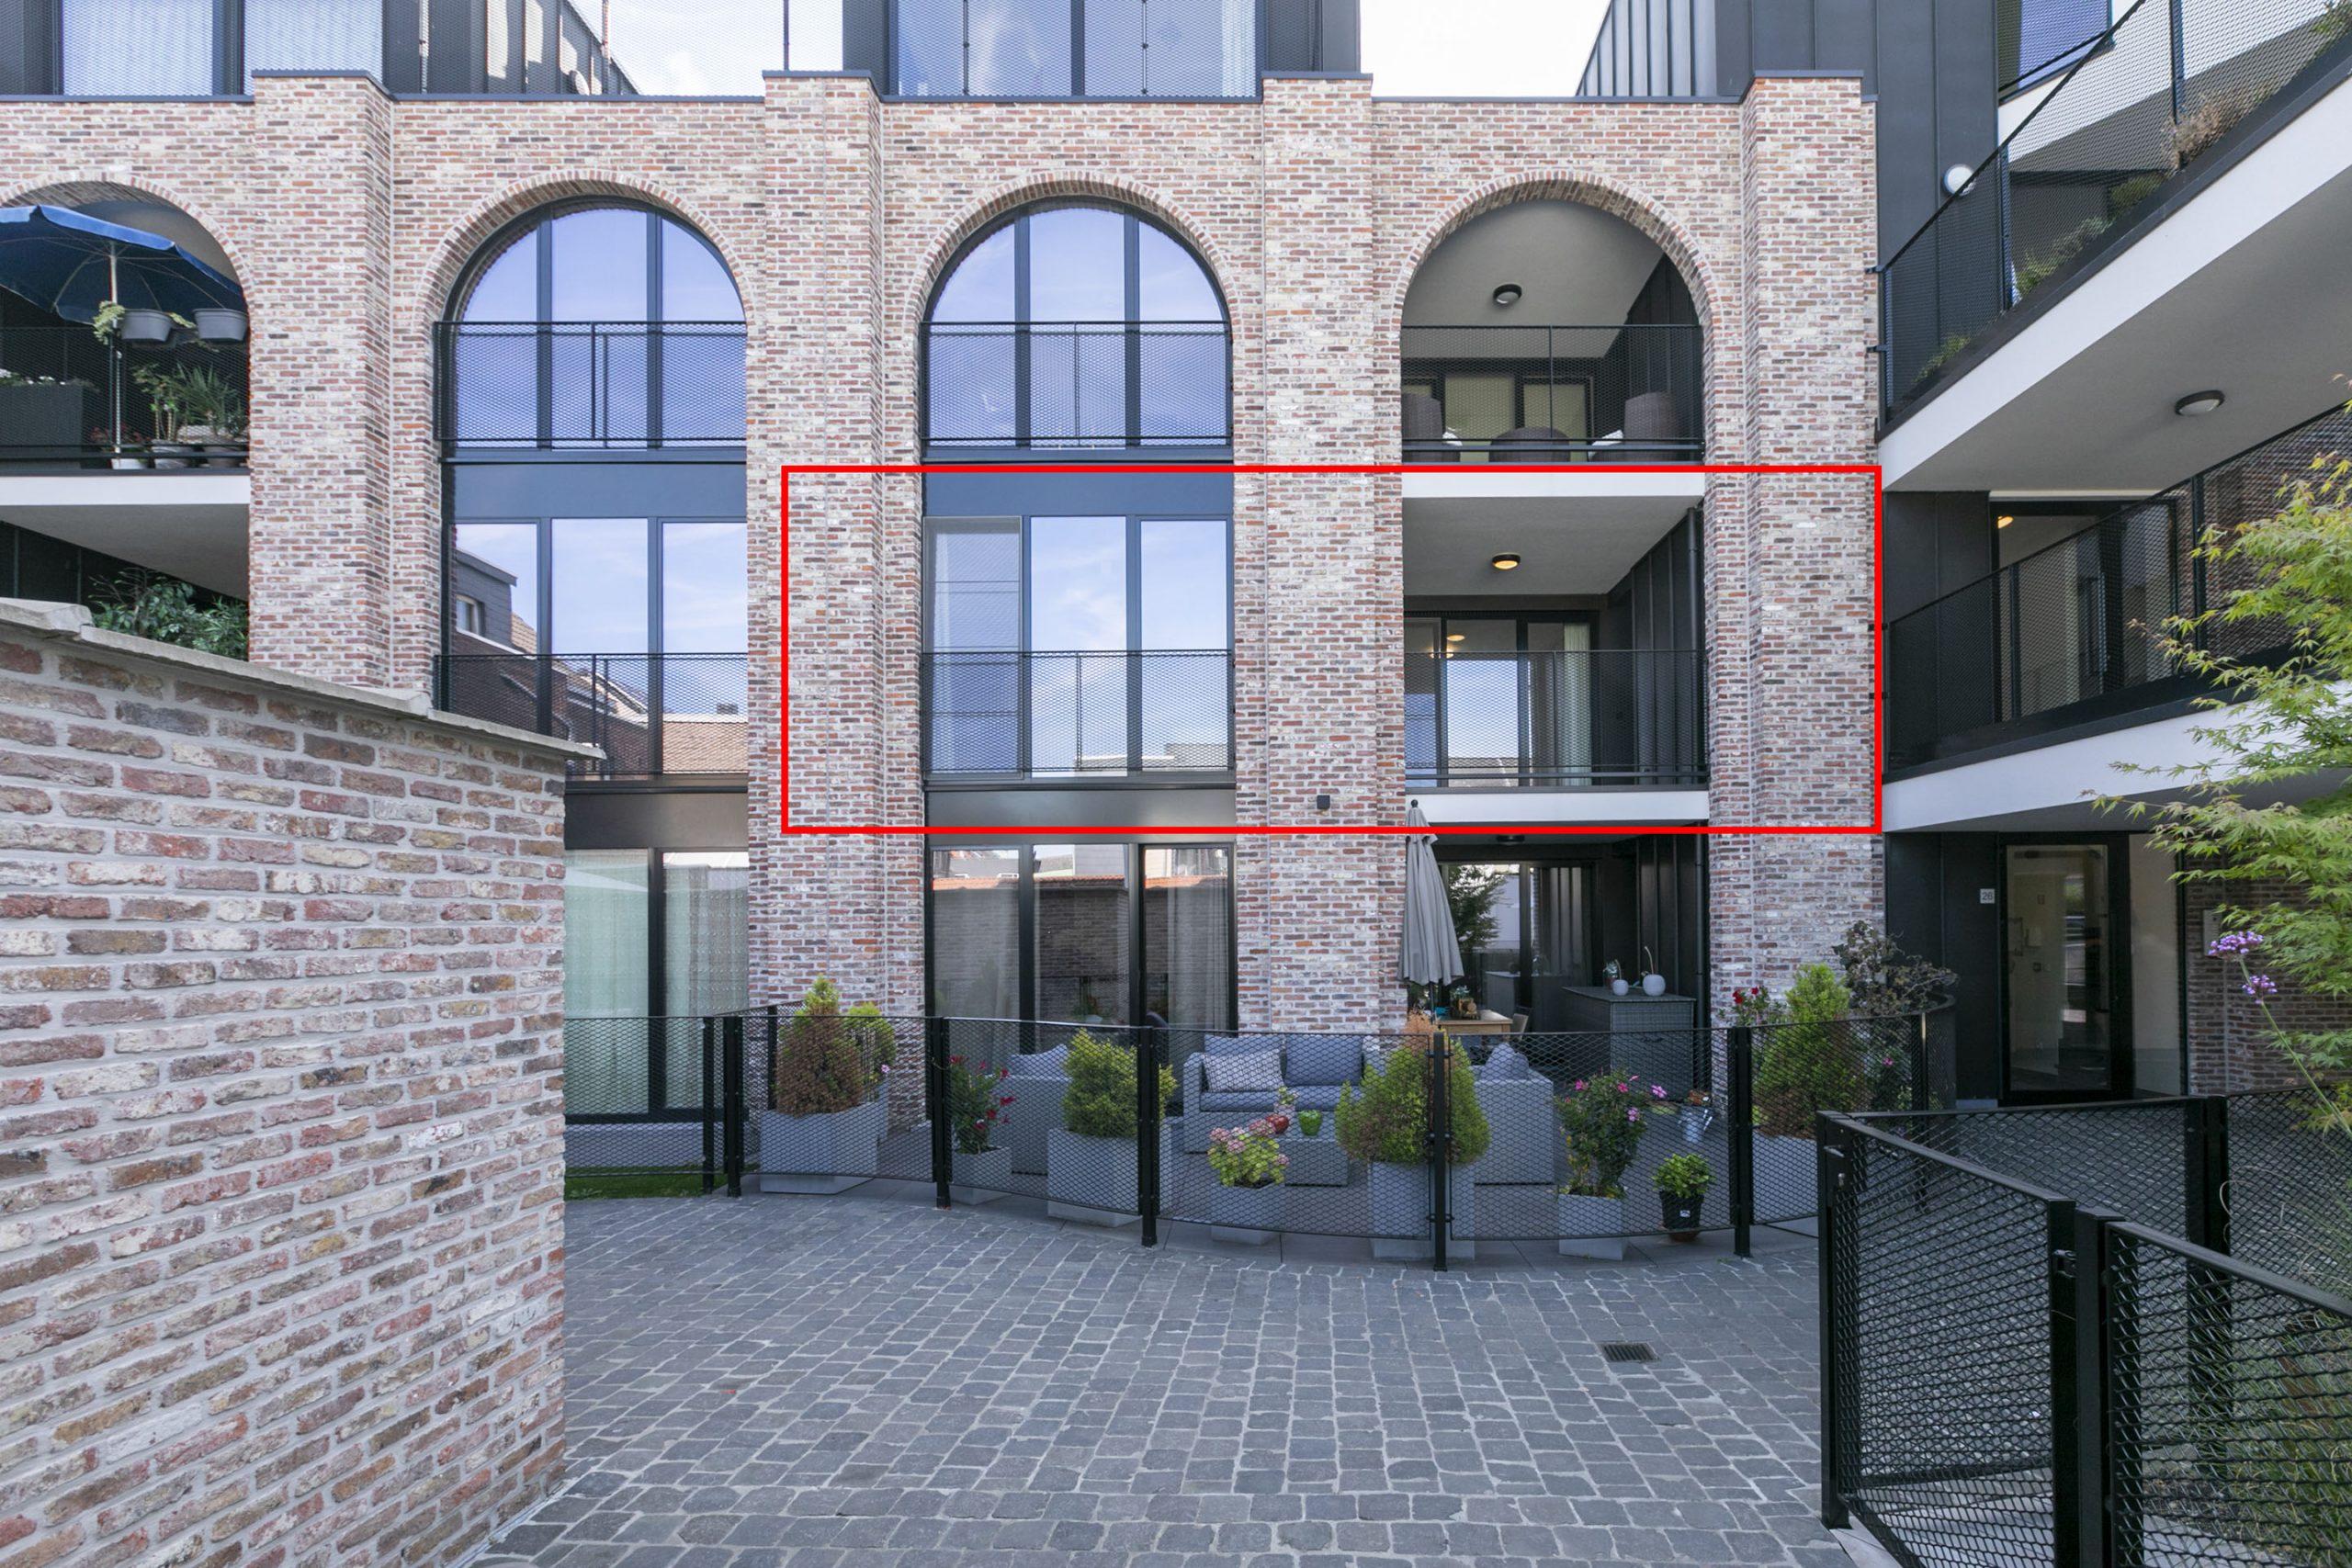 Modern 1 slaapkamer appartement met terras, kelderberging + autostpl.